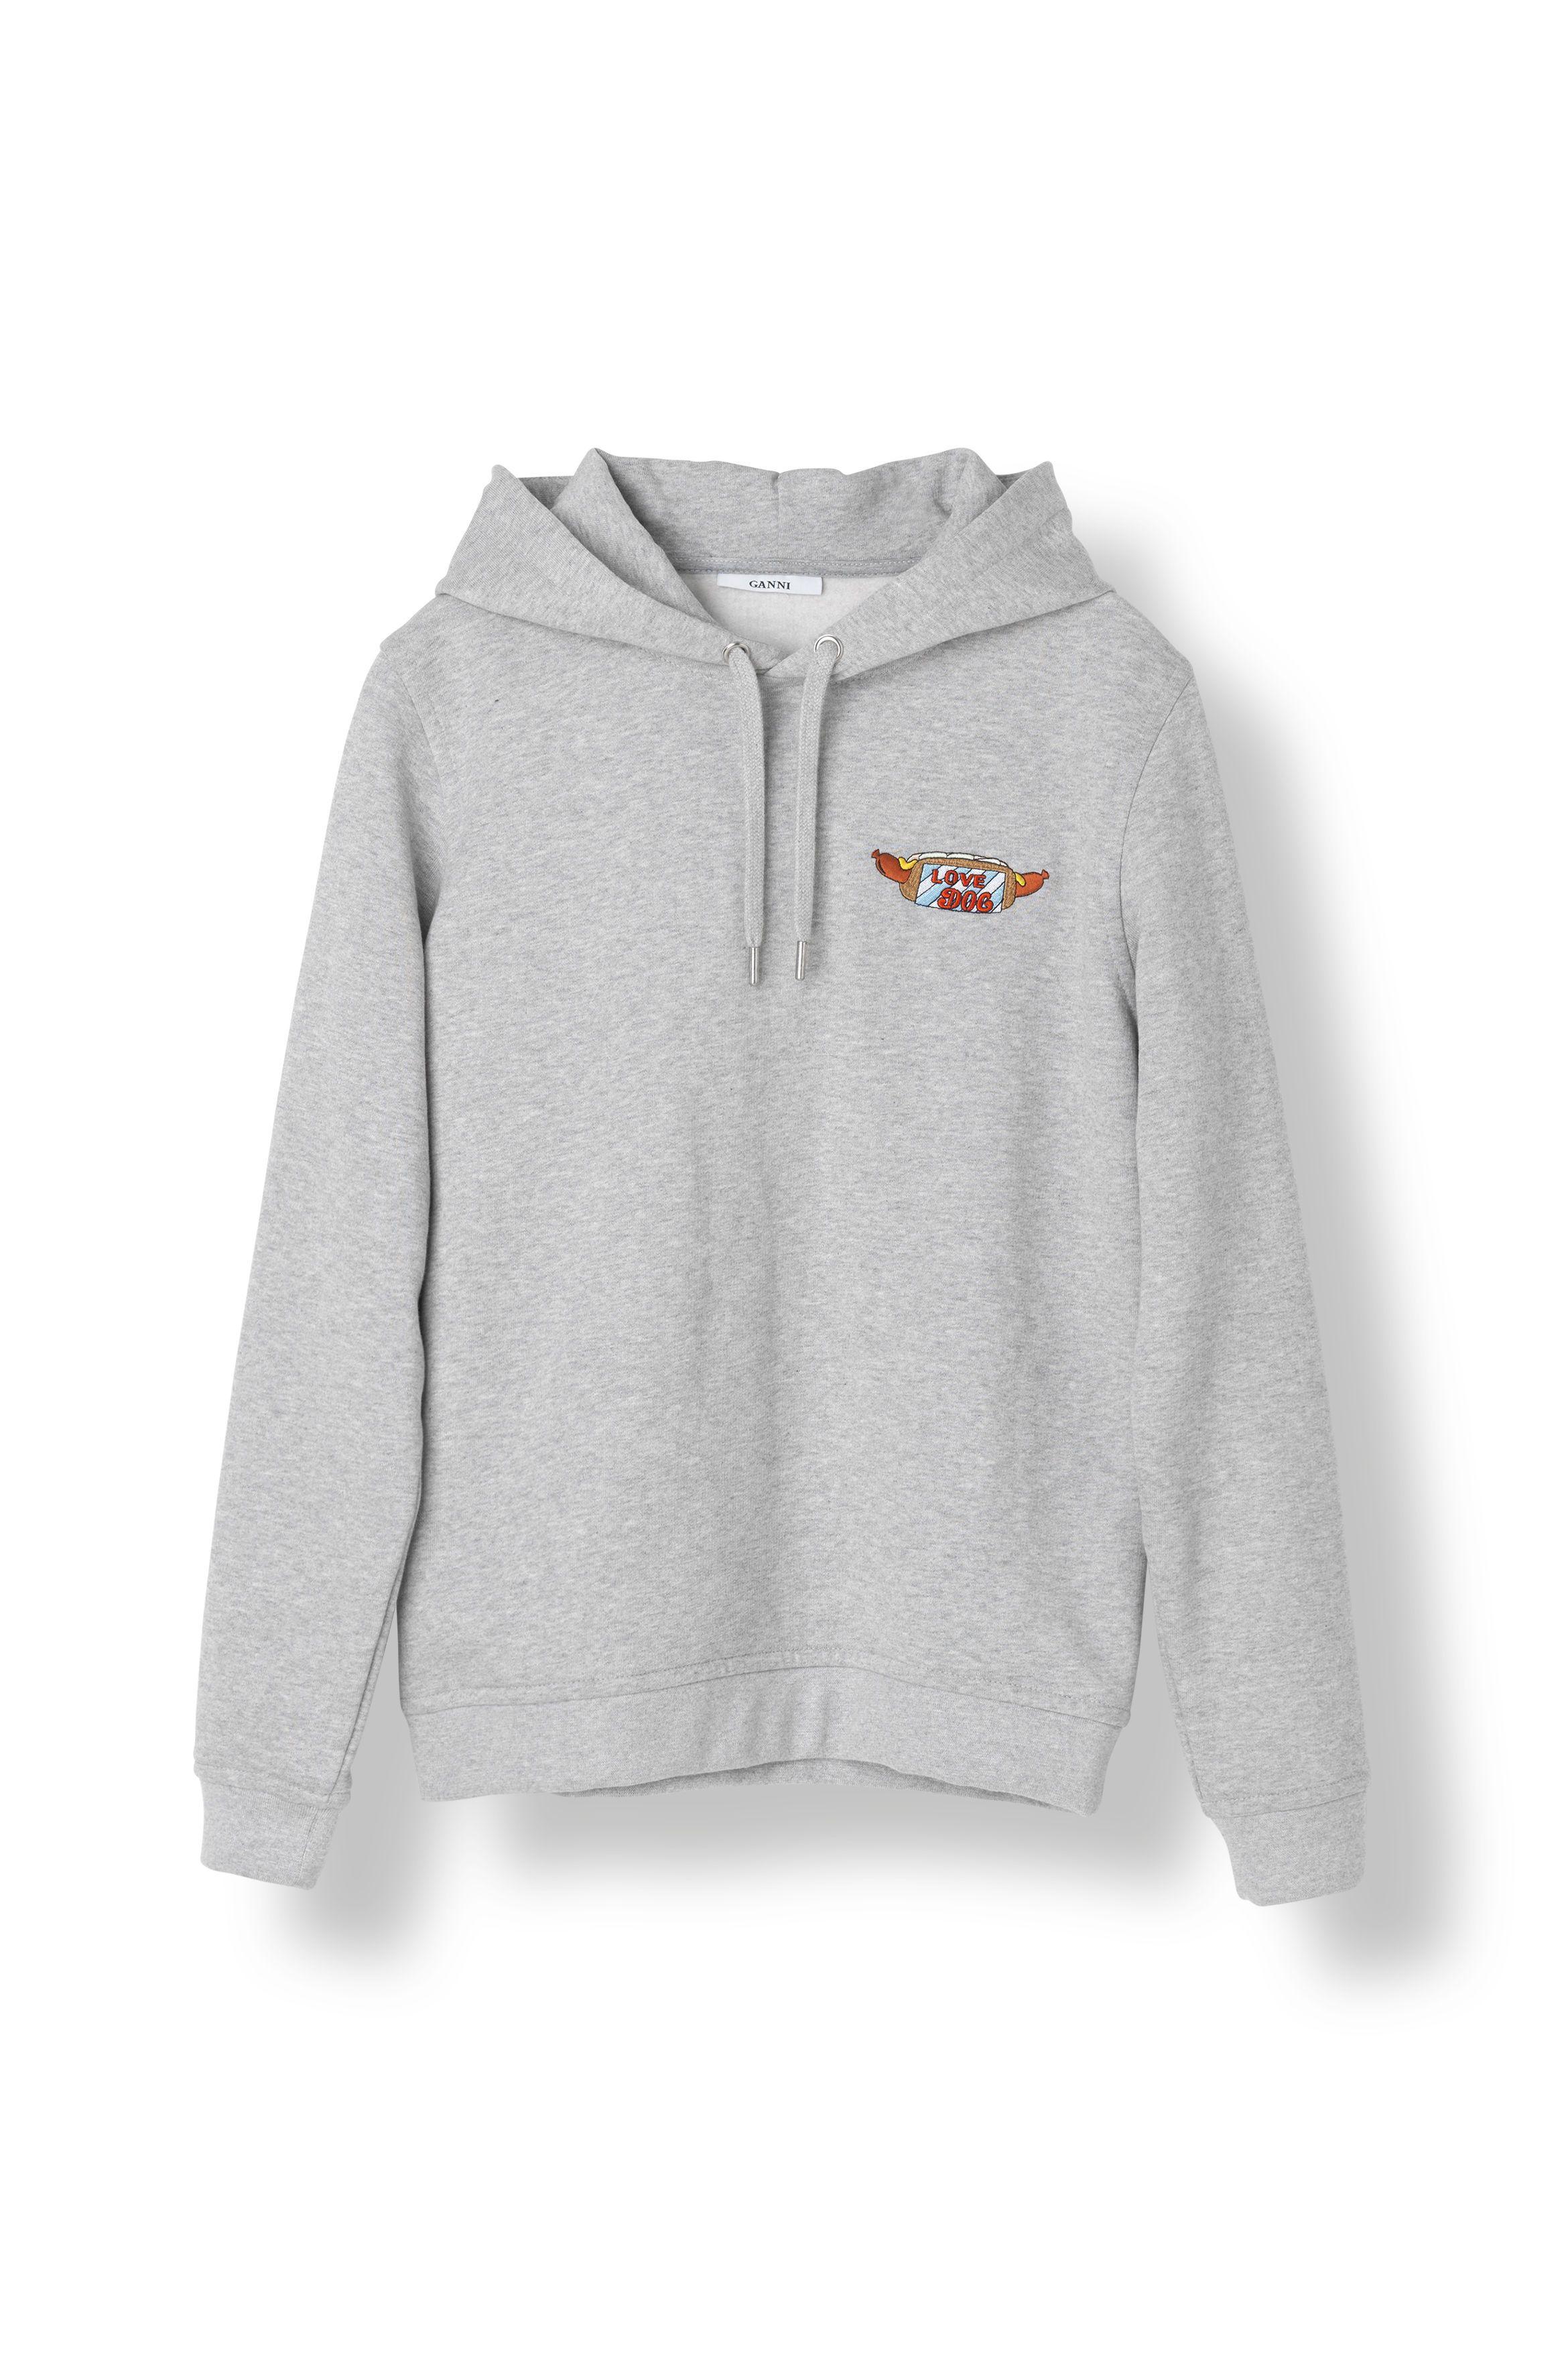 Lott Isoli Ganni Hoodie Ul Hoodies Gray Hoodies Sweatshirts [ 3512 x 2340 Pixel ]